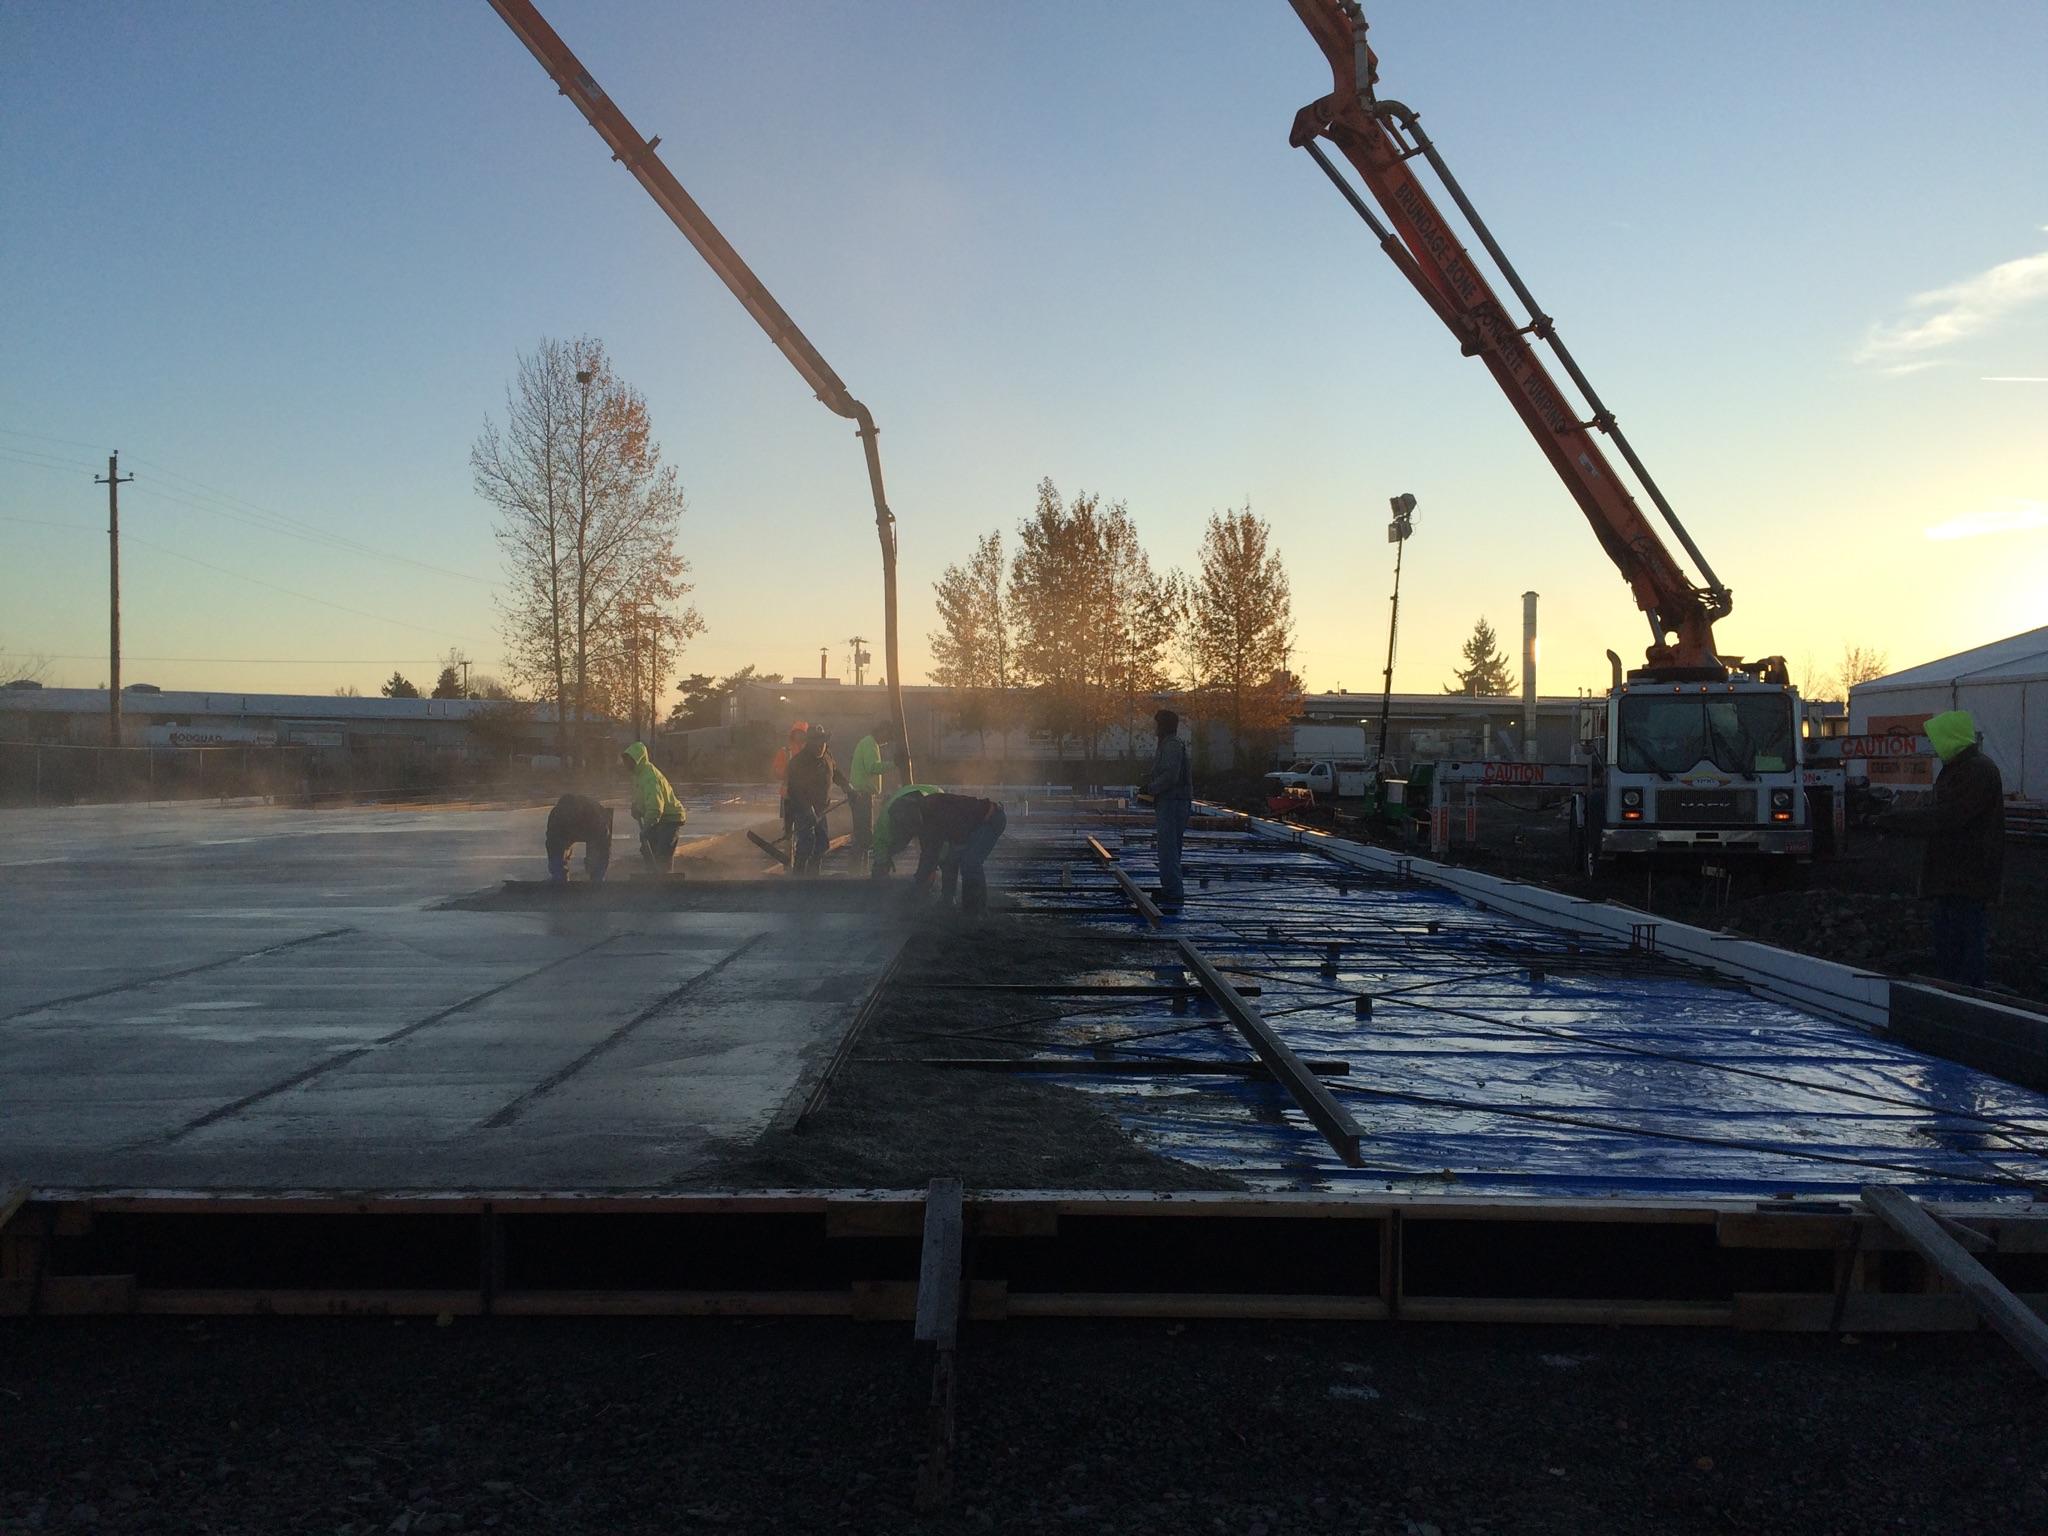 Pouring concrete.